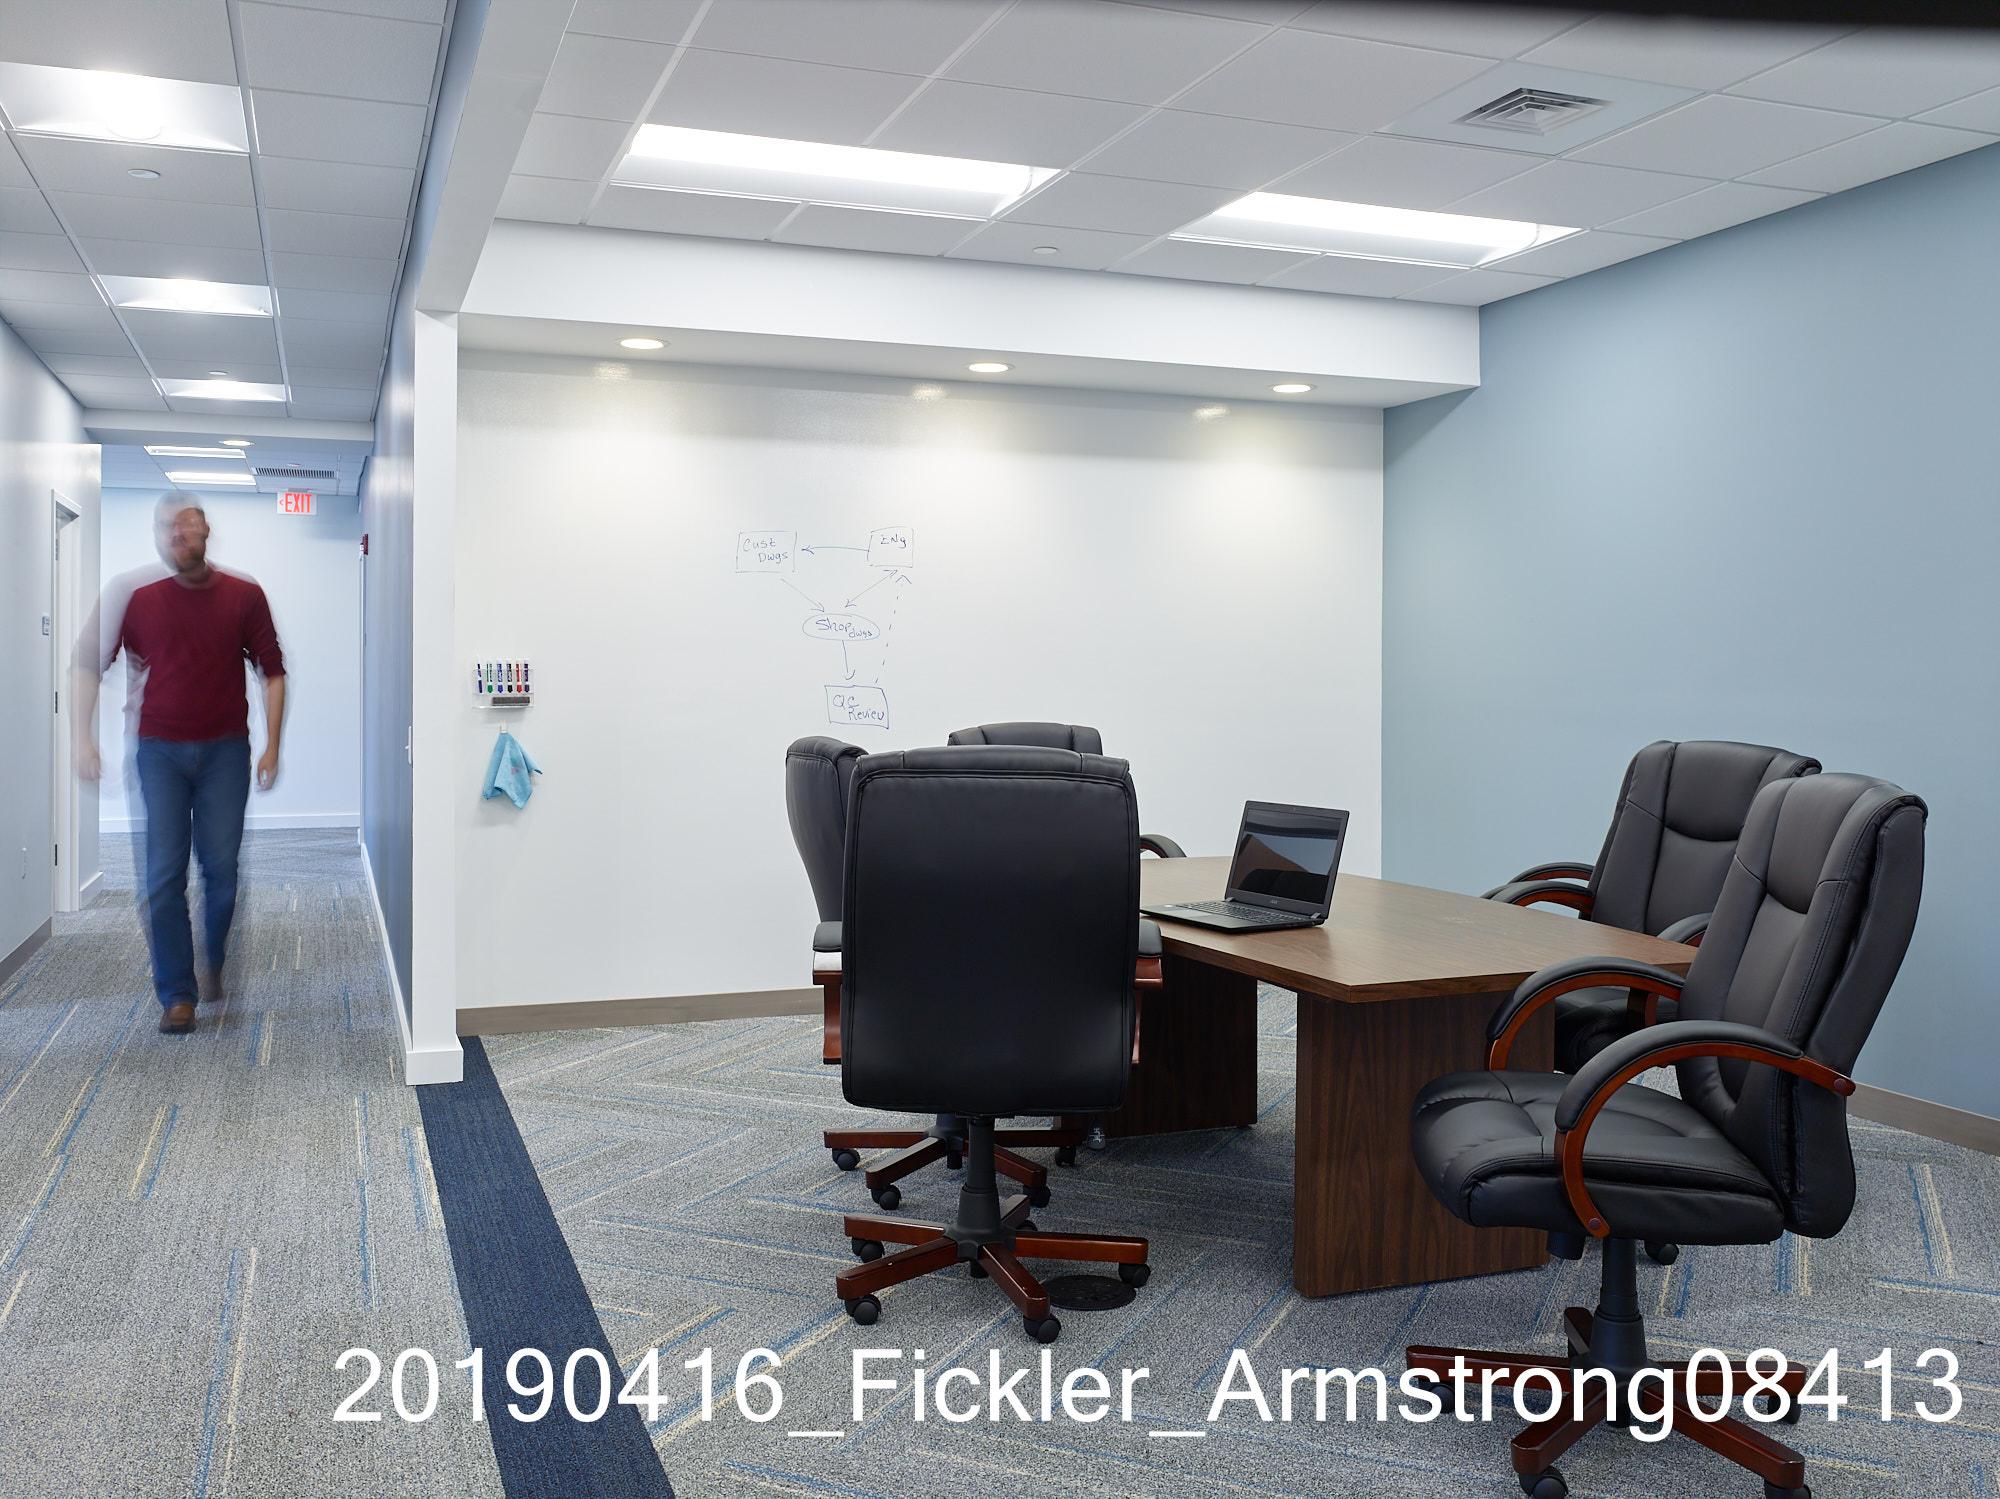 20190416_Fickler_Armstrong08413.jpg